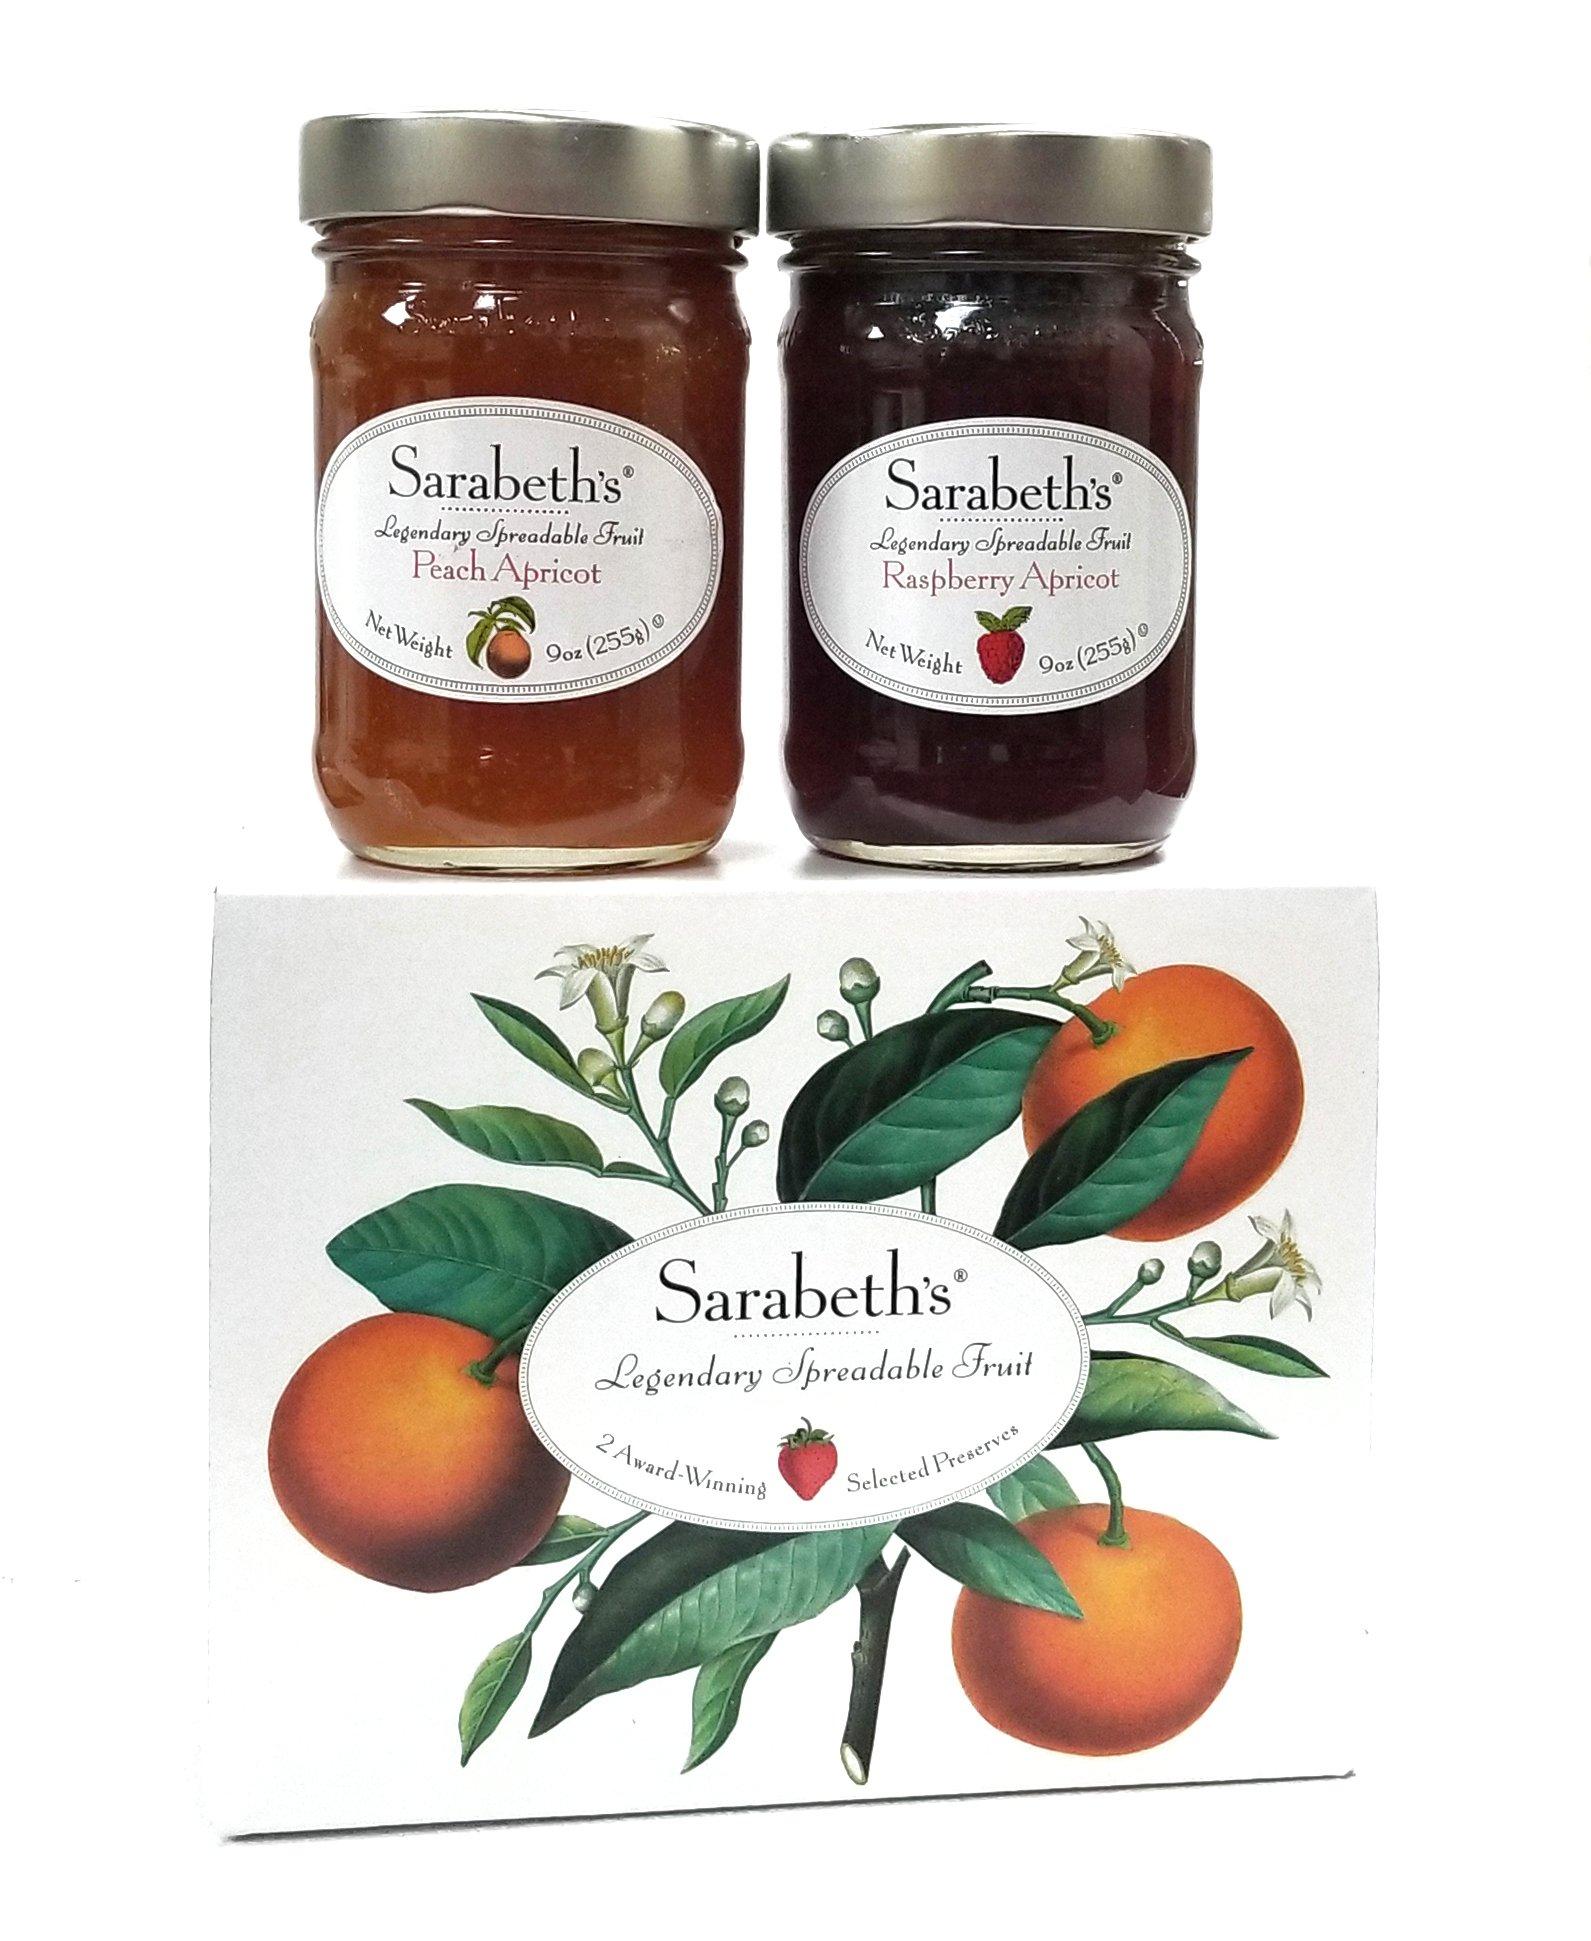 Sarabeth's Two Jar Gift Box Set - Two 9 oz. jars - Peach Apricot & Raspberry Apricot by Sarabeth's